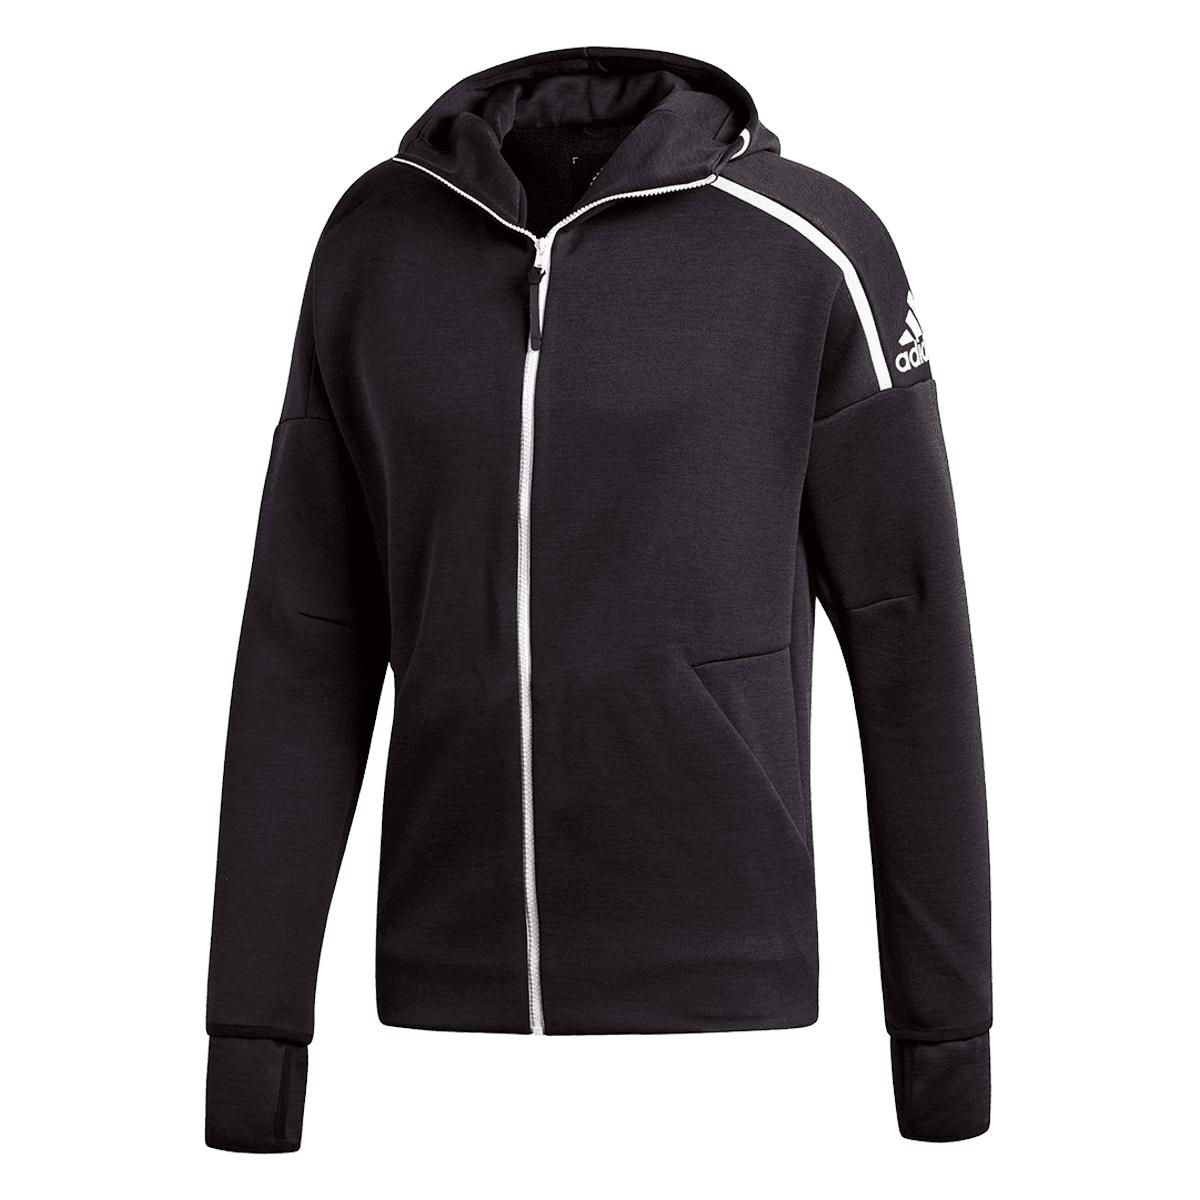 Adidas Z.N.E Pulse Hoodie Jacke für 35,94 Euro (NUR 2XL)